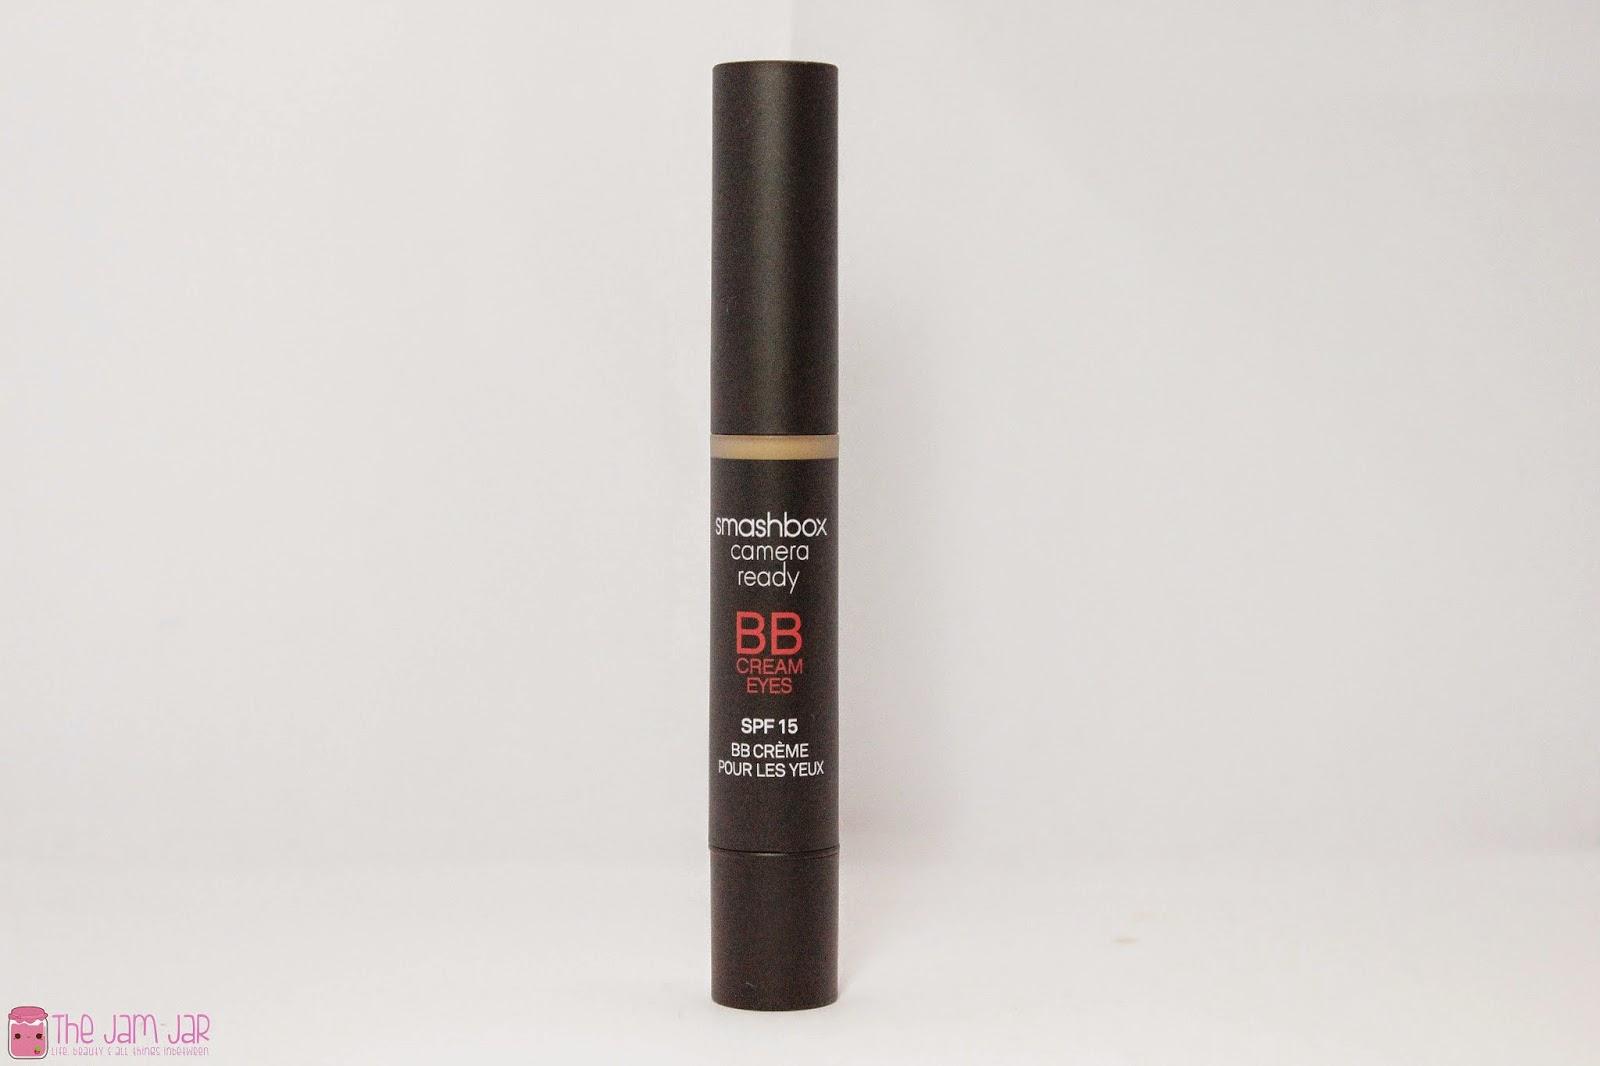 http://www.beautybulletin.com/makeup/bb-creams/smashbox-camera-ready-bb-cream-eyes-in-medium